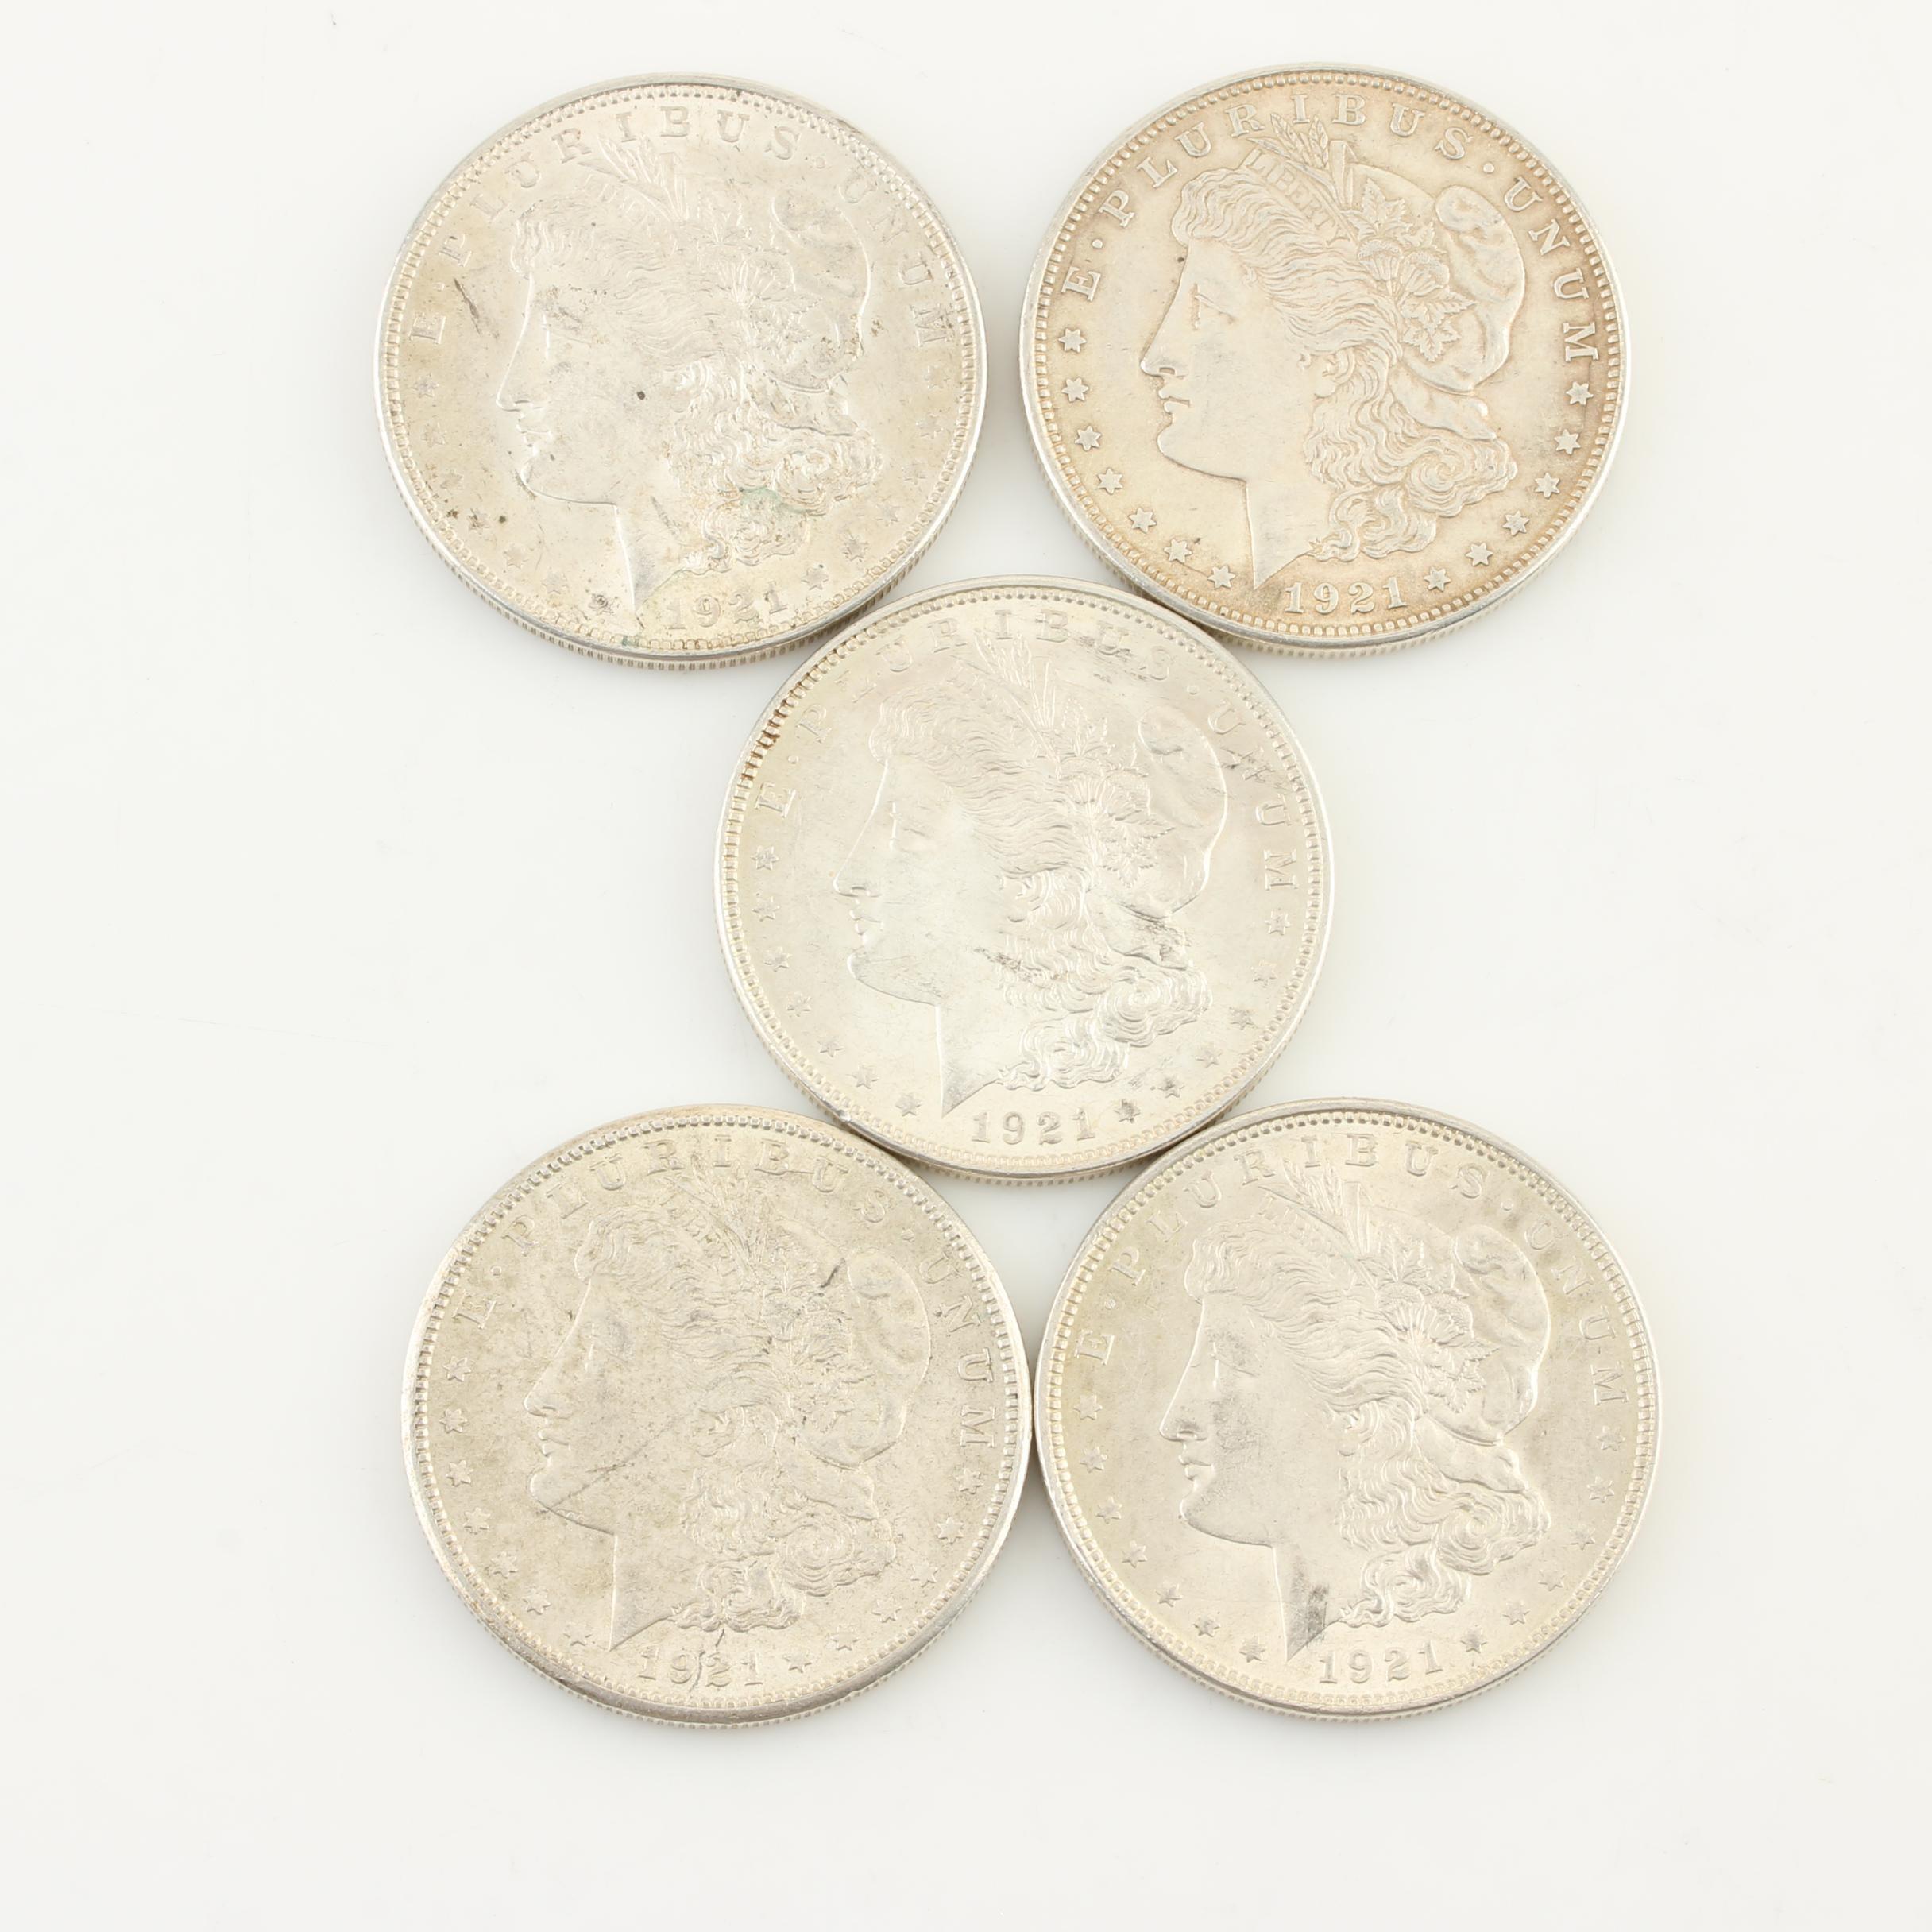 Group of Five 1921 Morgan Silver Dollars